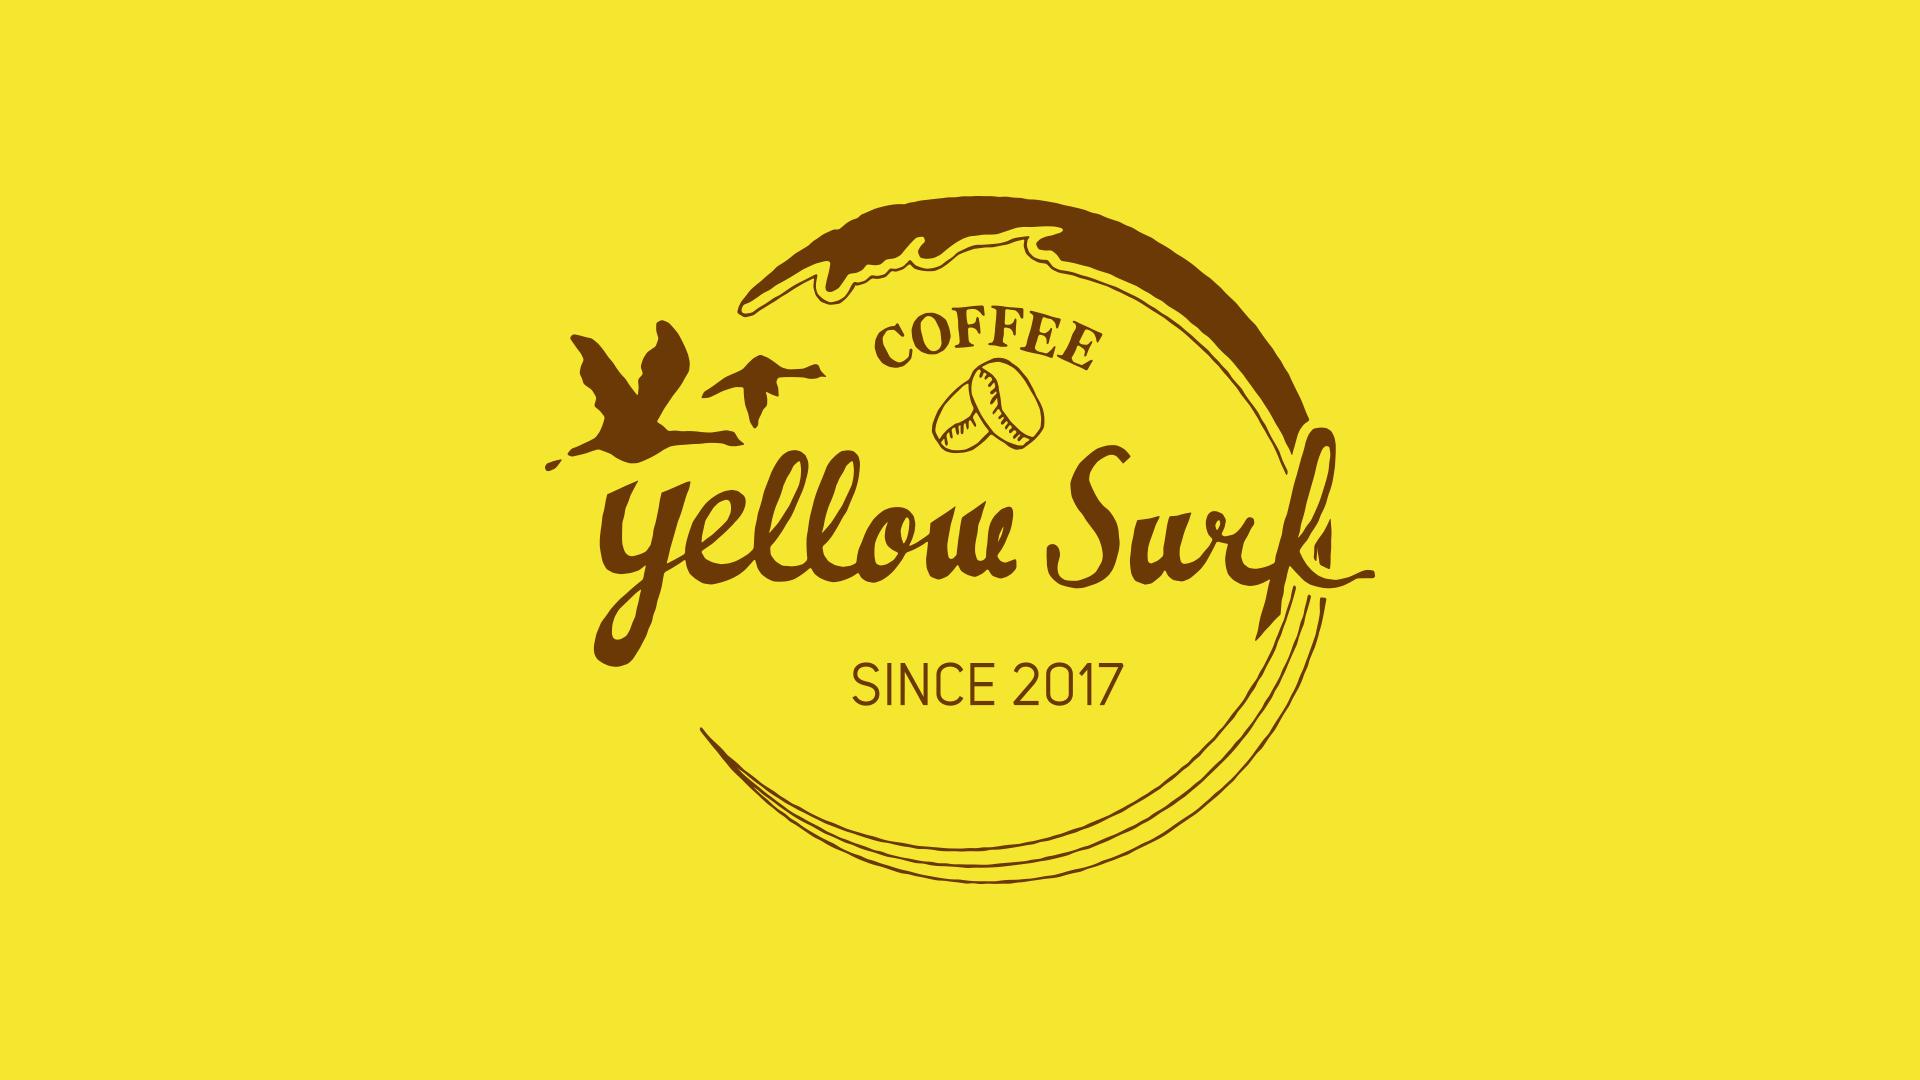 yellow surf coffeeさんのロゴマーク